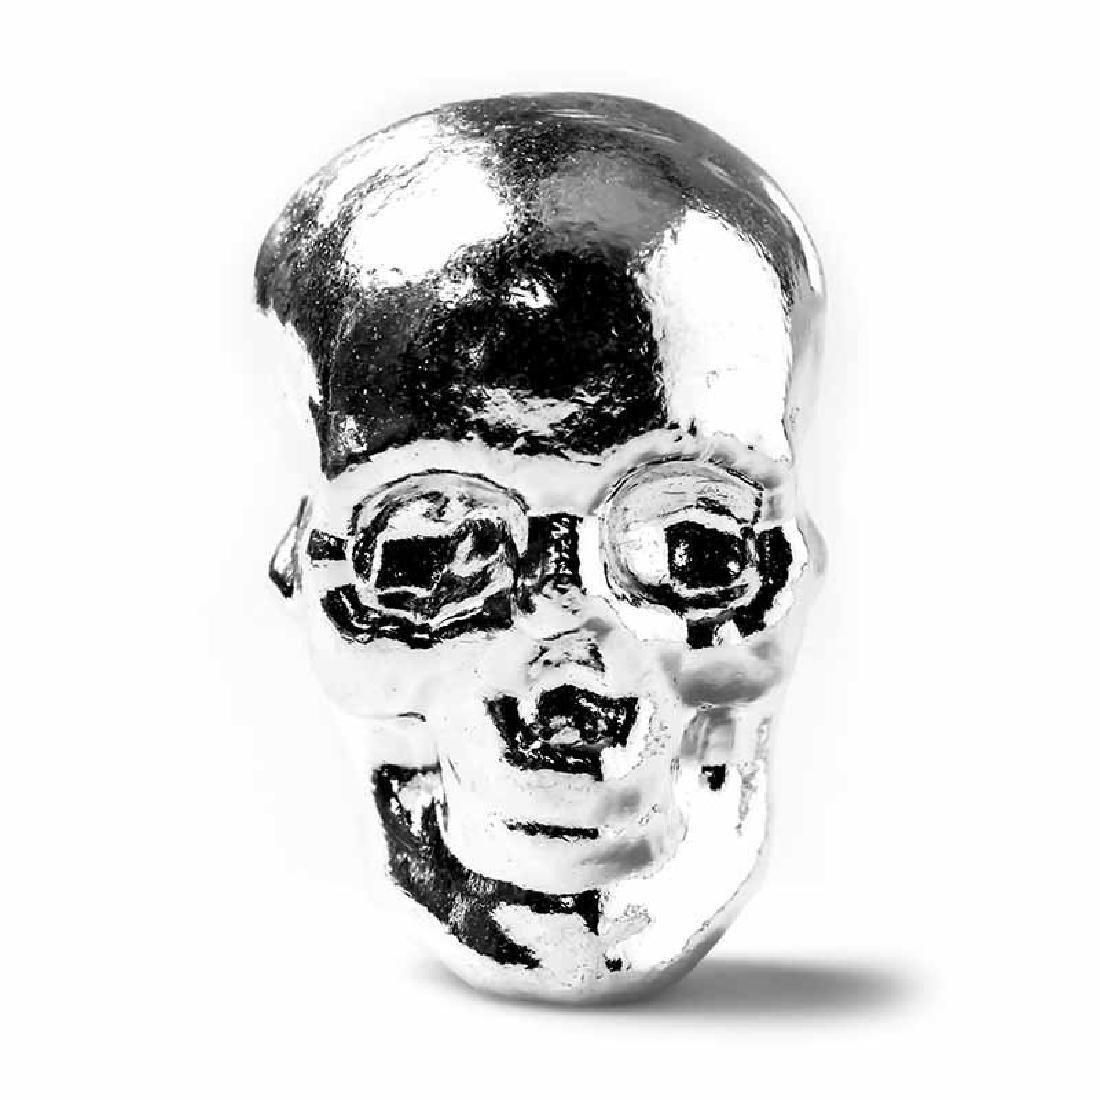 5 oz Atlantis Mint Hand Poured .999 Silver Skull